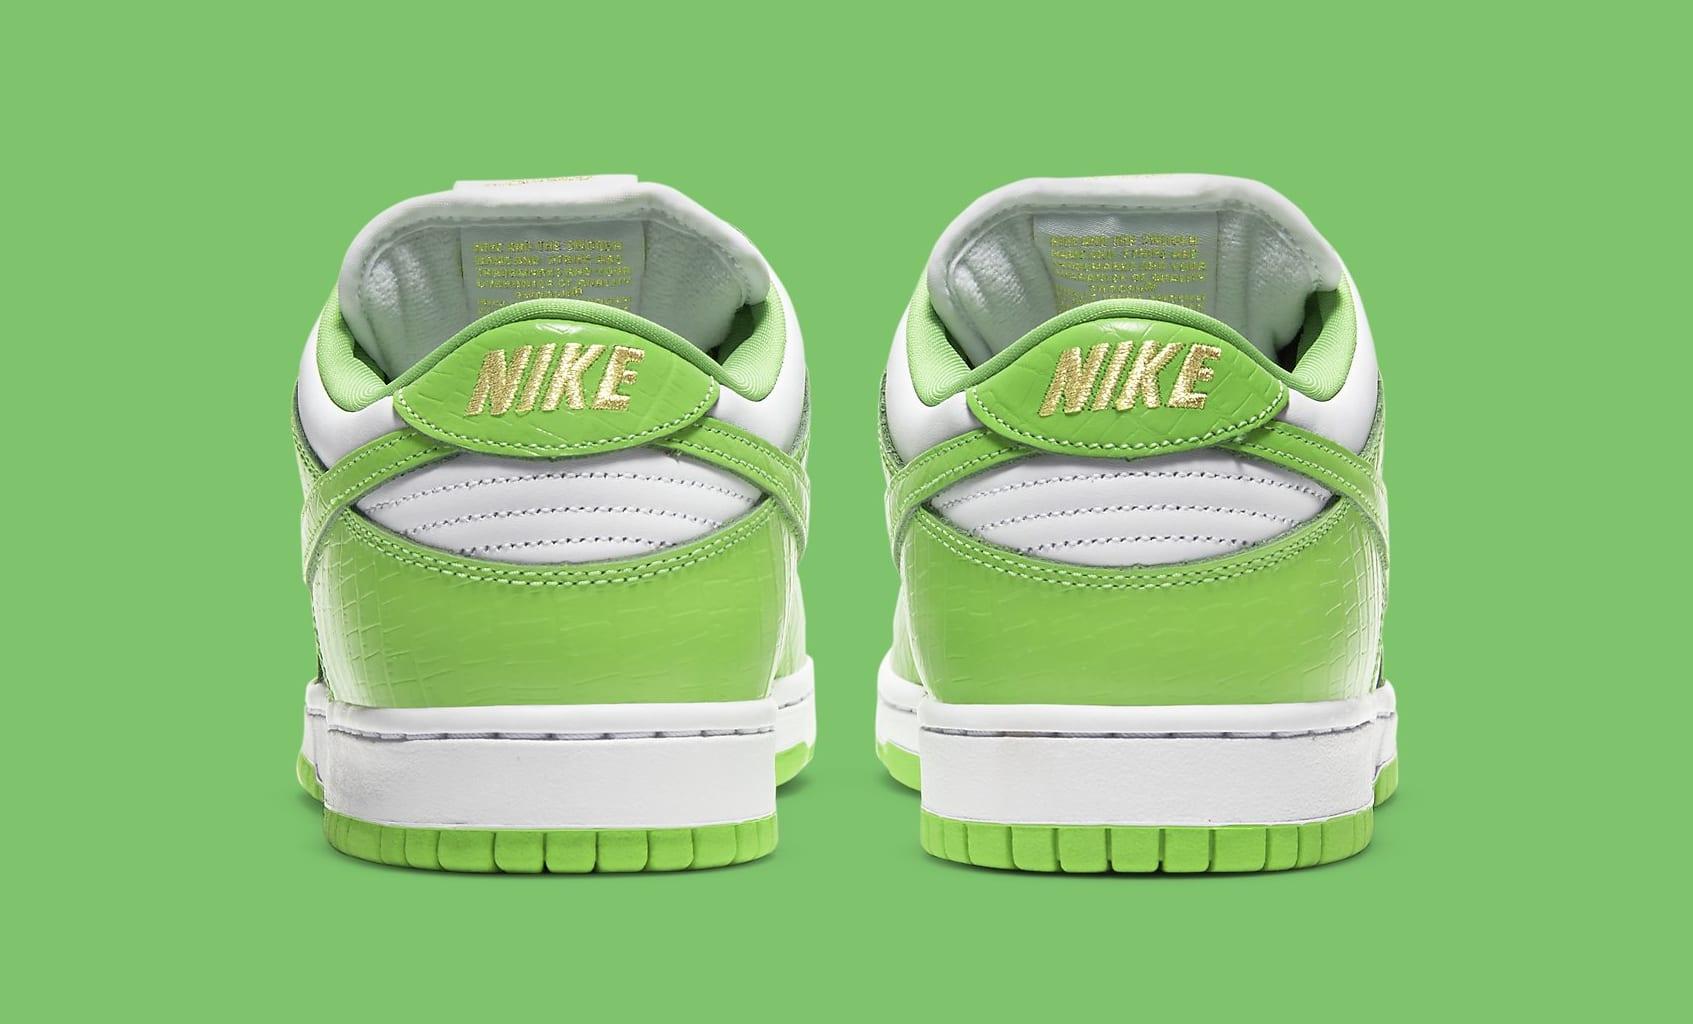 Supreme x Nike SB Dunk Low 'Green' DH3228-101 Heel